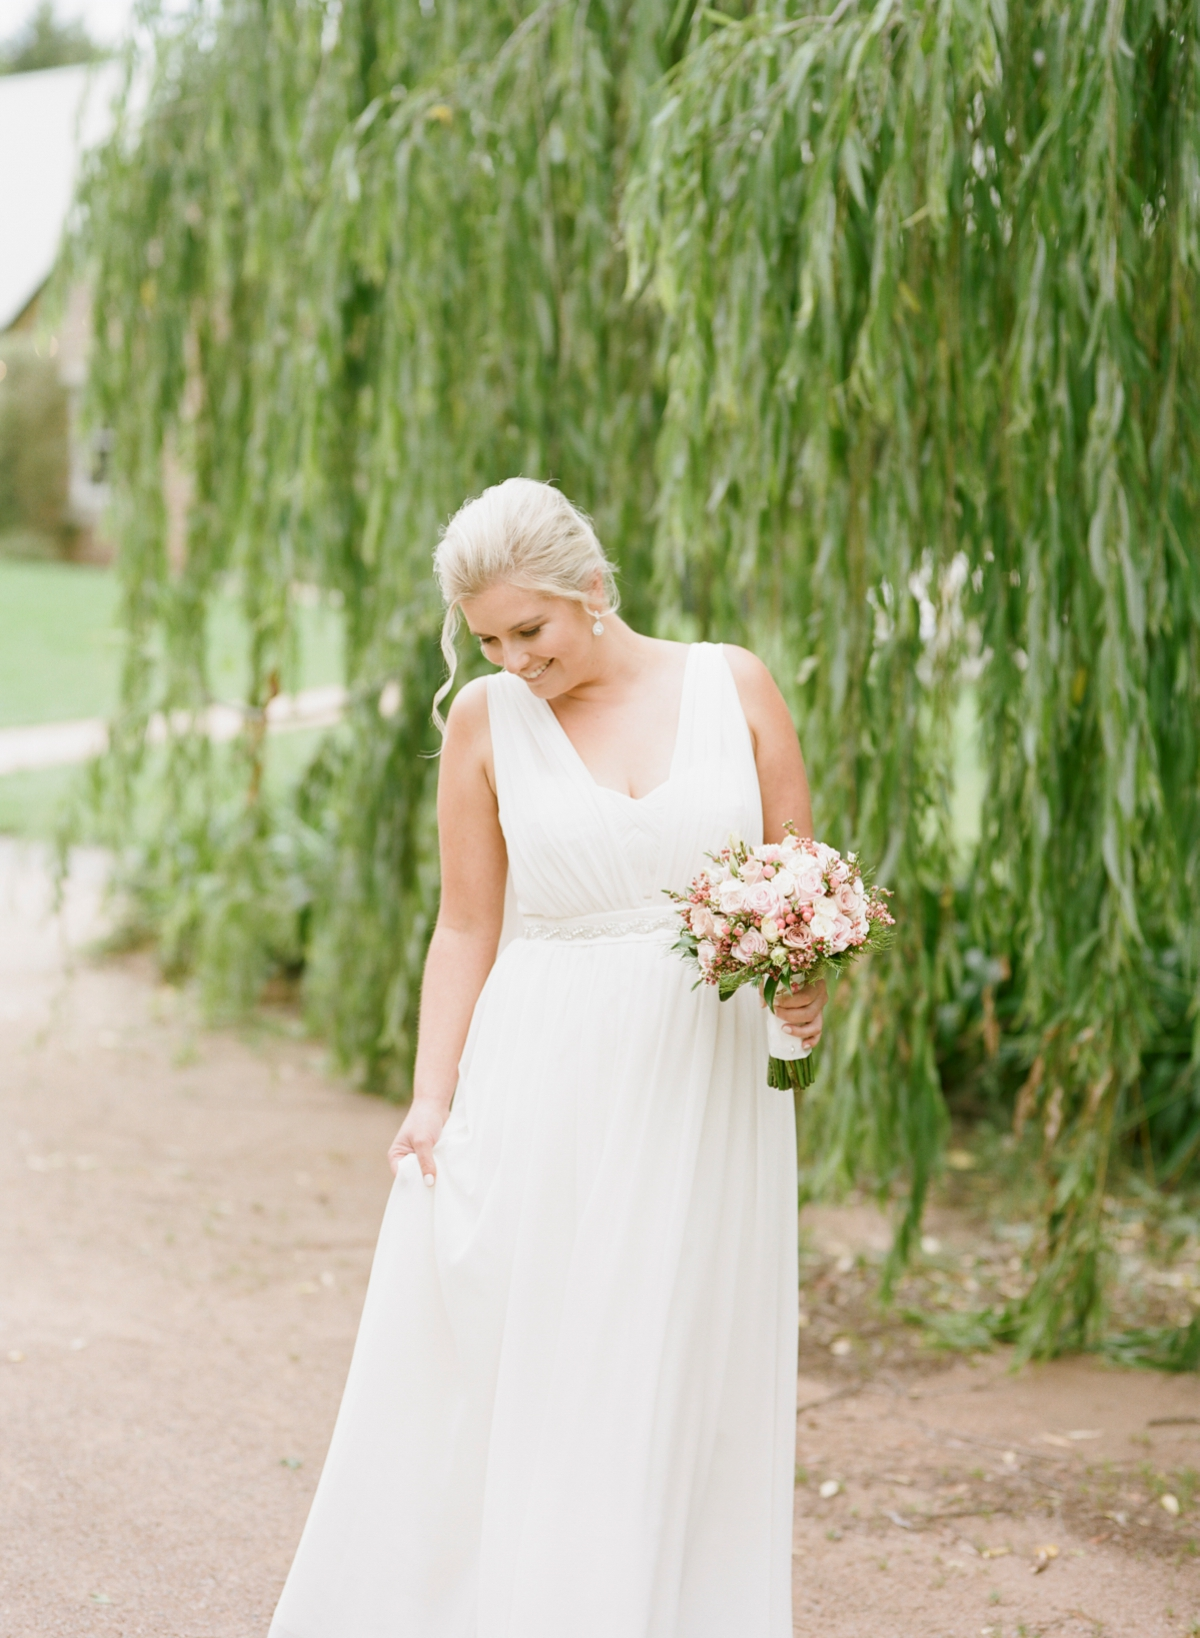 Monterose berry farm wedding by Mr Edwards Photography_0727.jpg